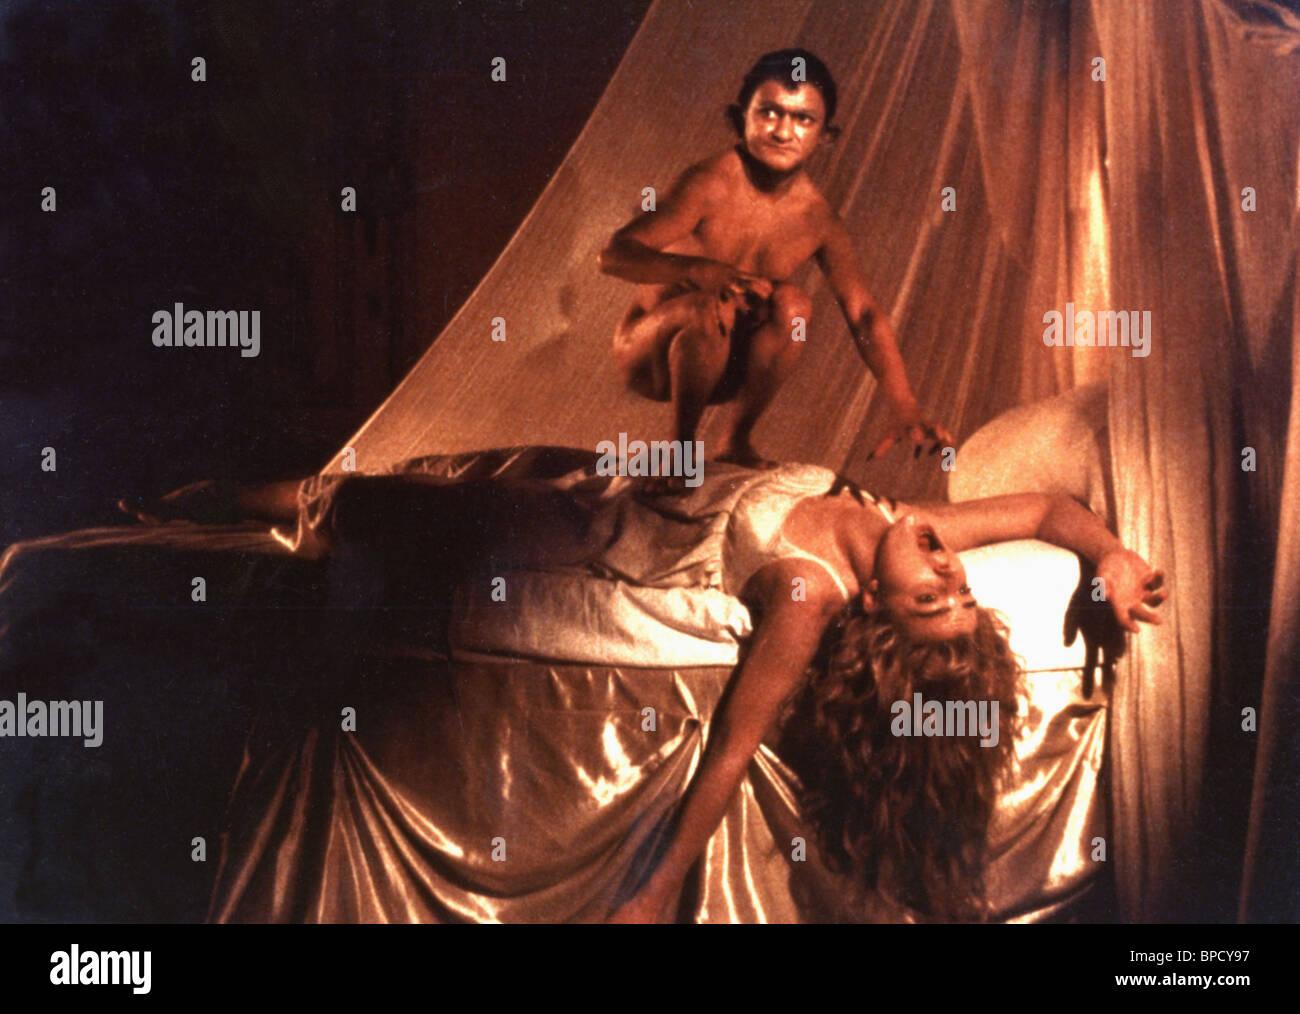 NATASHA RICHARDSON gotico (1986) Immagini Stock